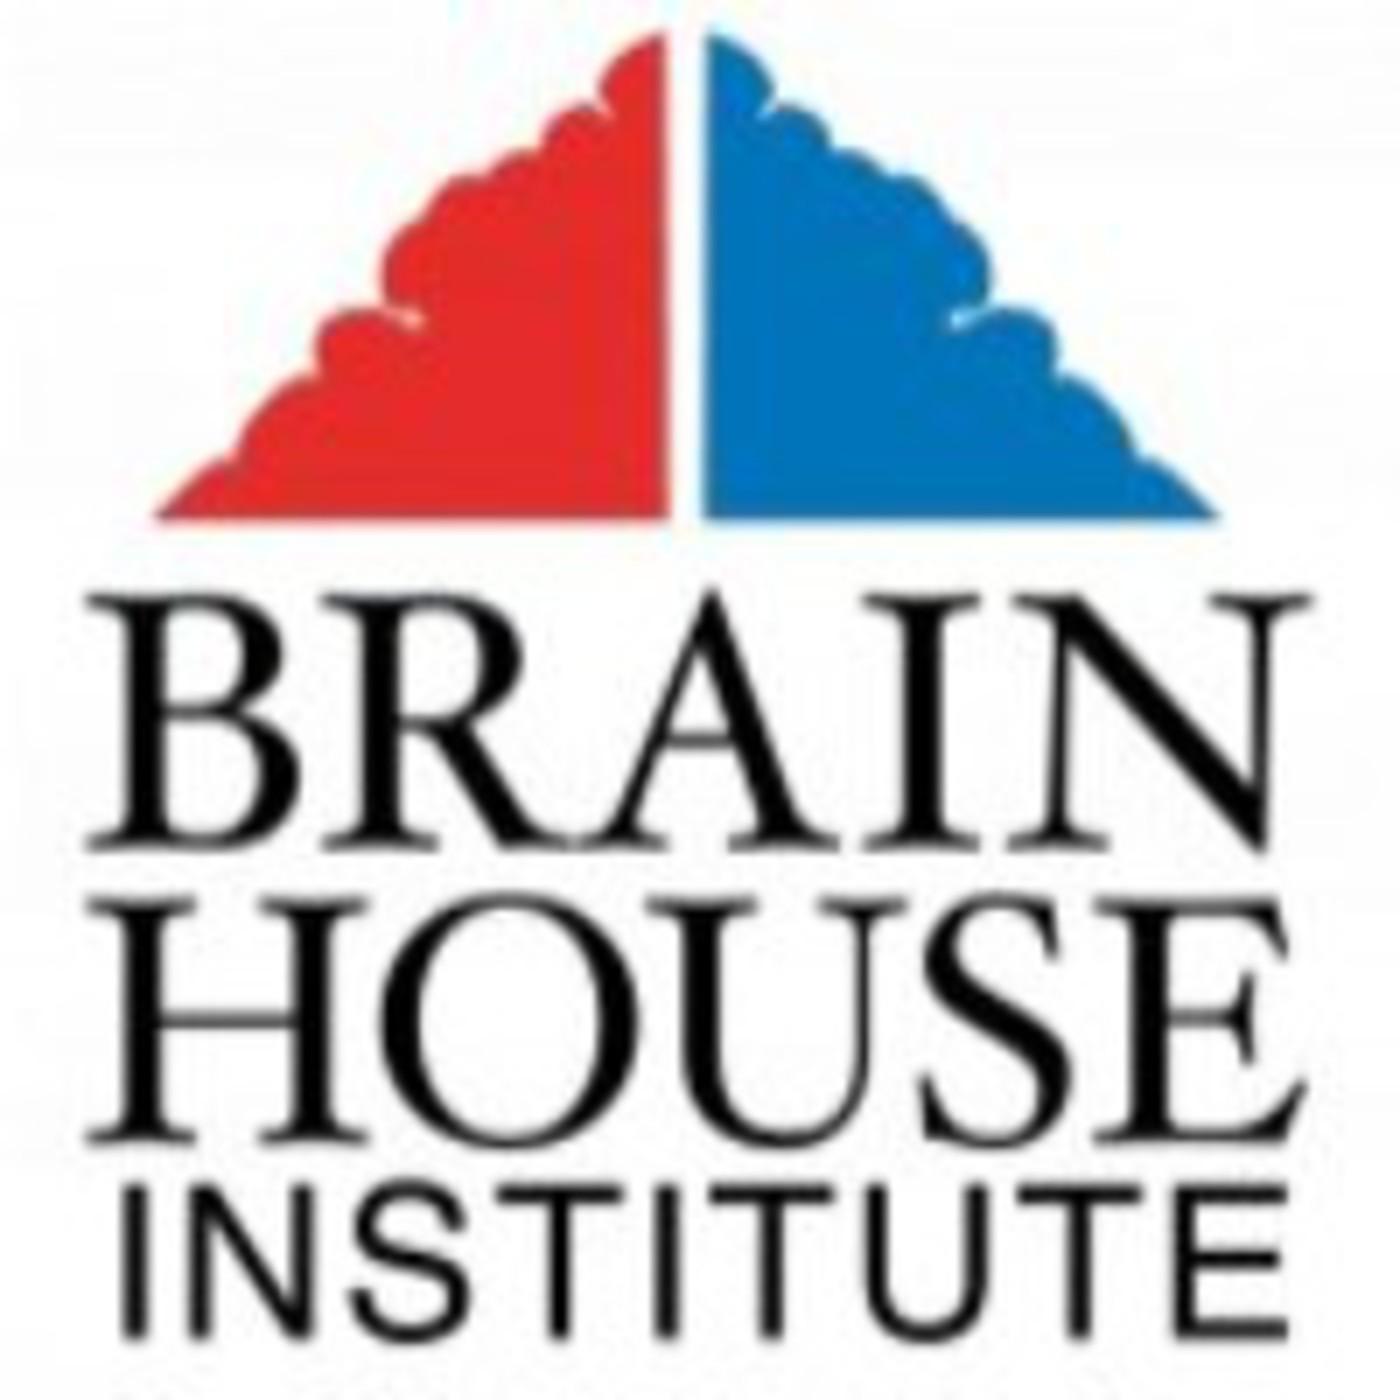 Neurociencia con BrainHouse 14/11/14